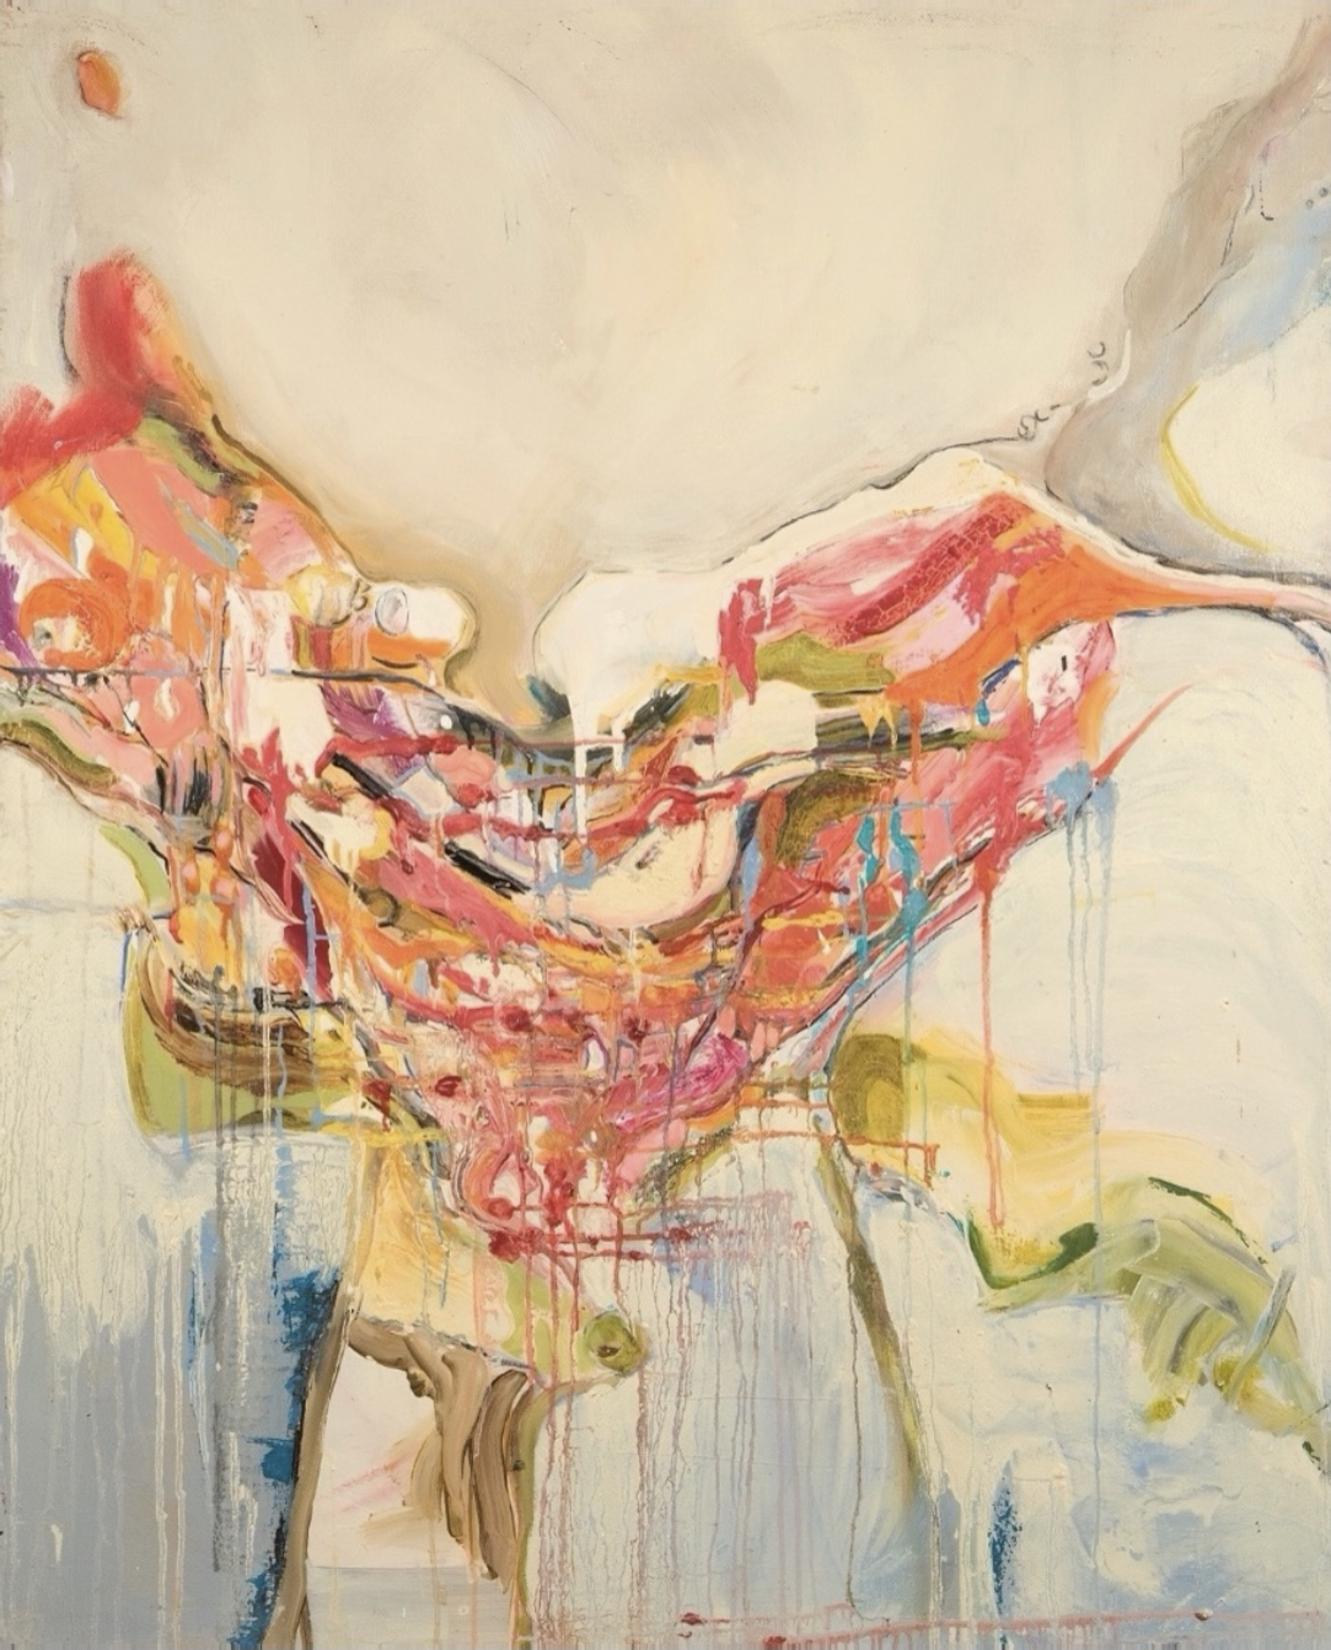 Gail Winbury / Rhapsody in Red